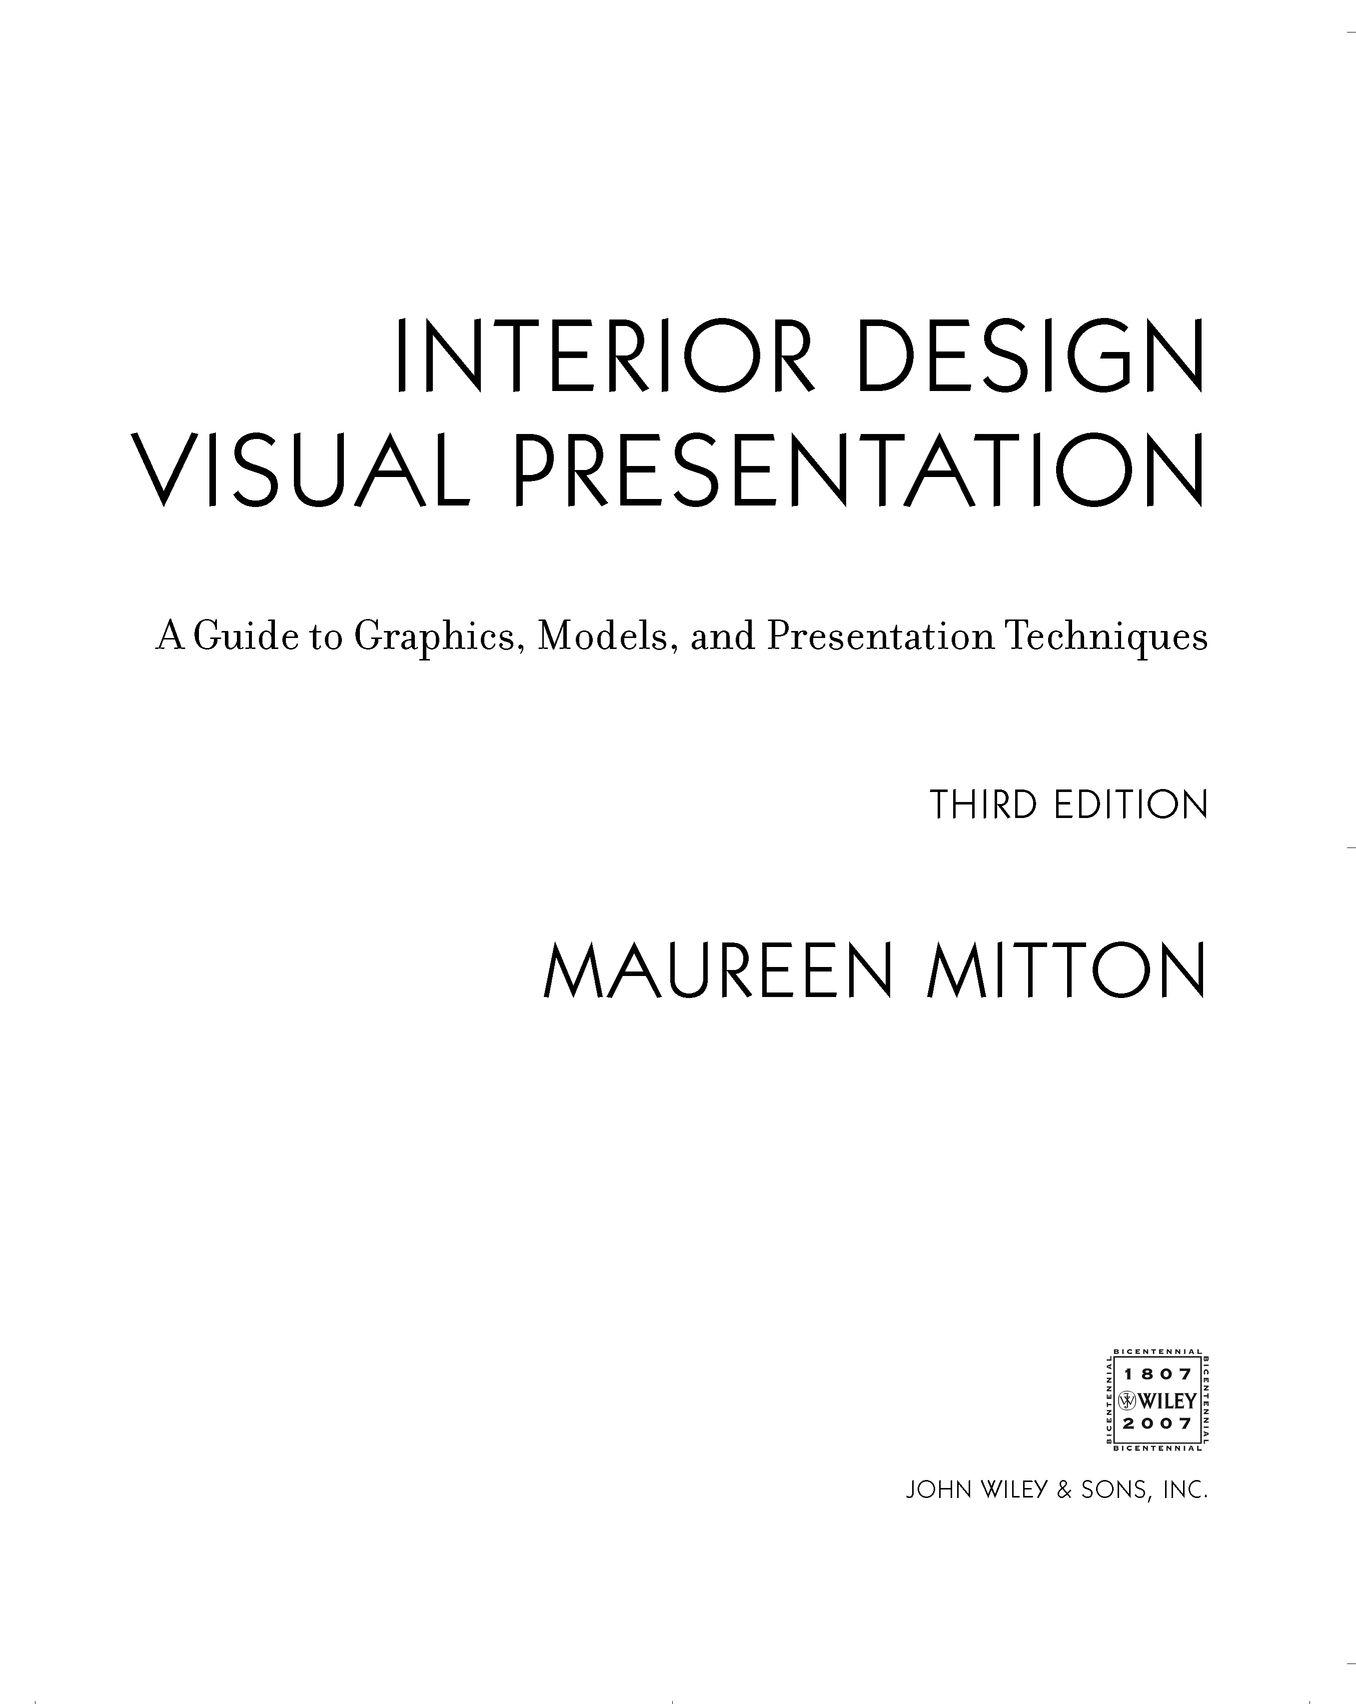 for Interior design visual presentation